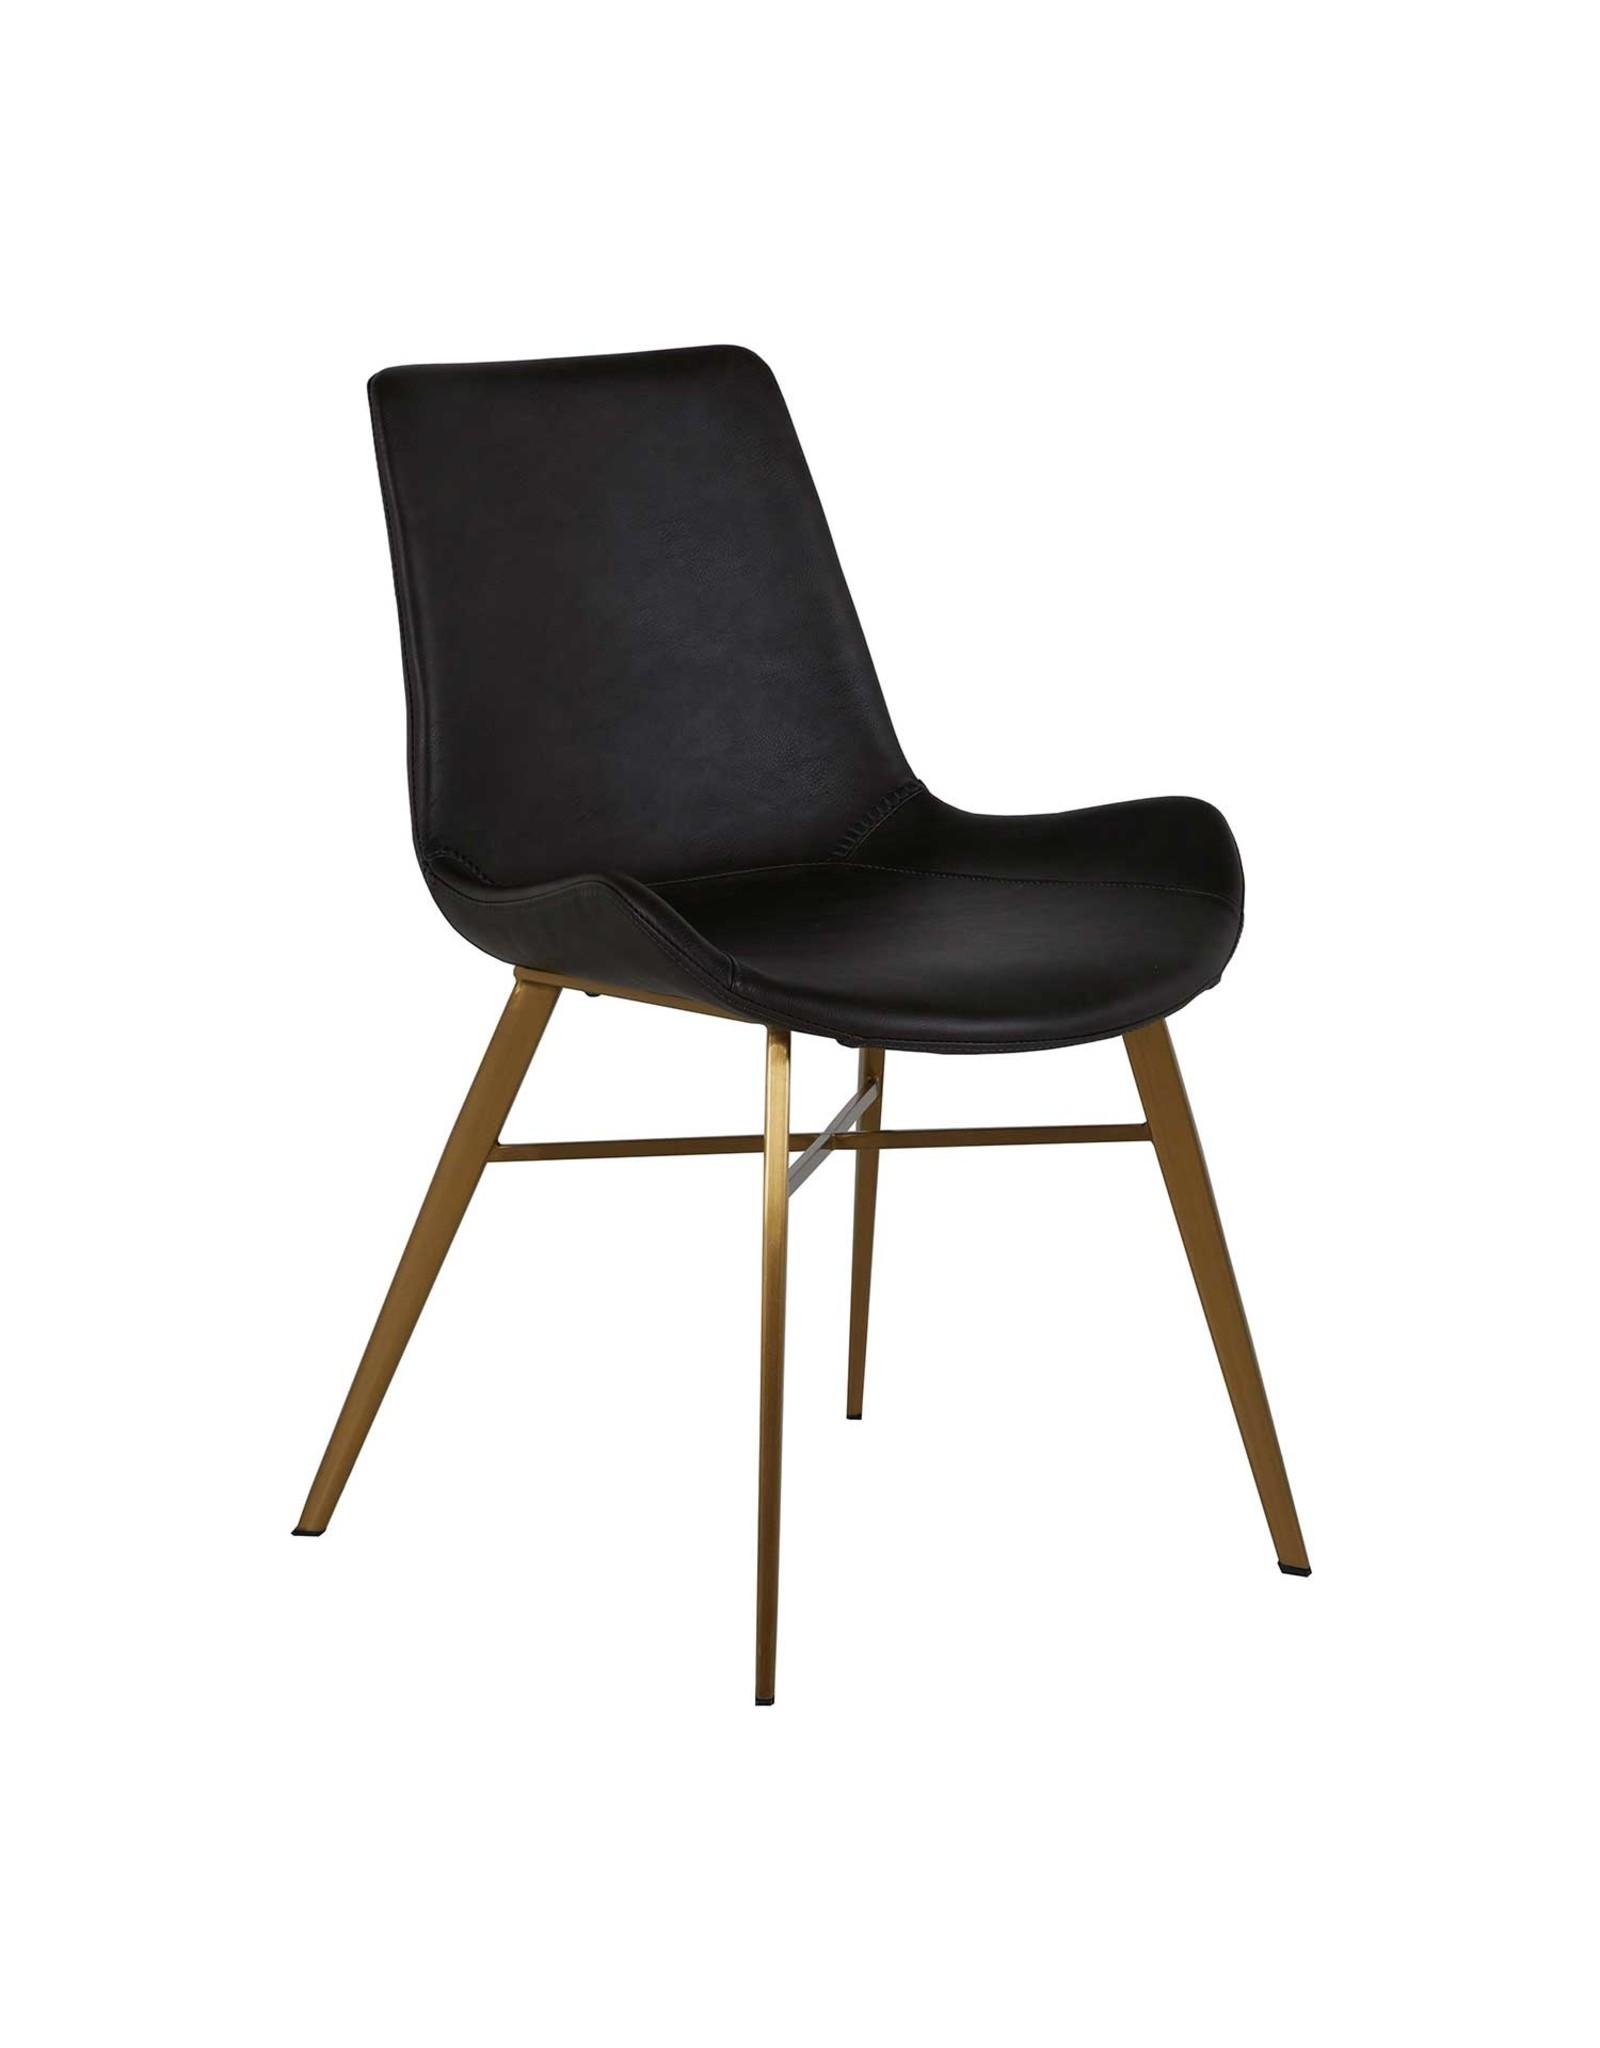 Website Gabby Hines Desk Chair